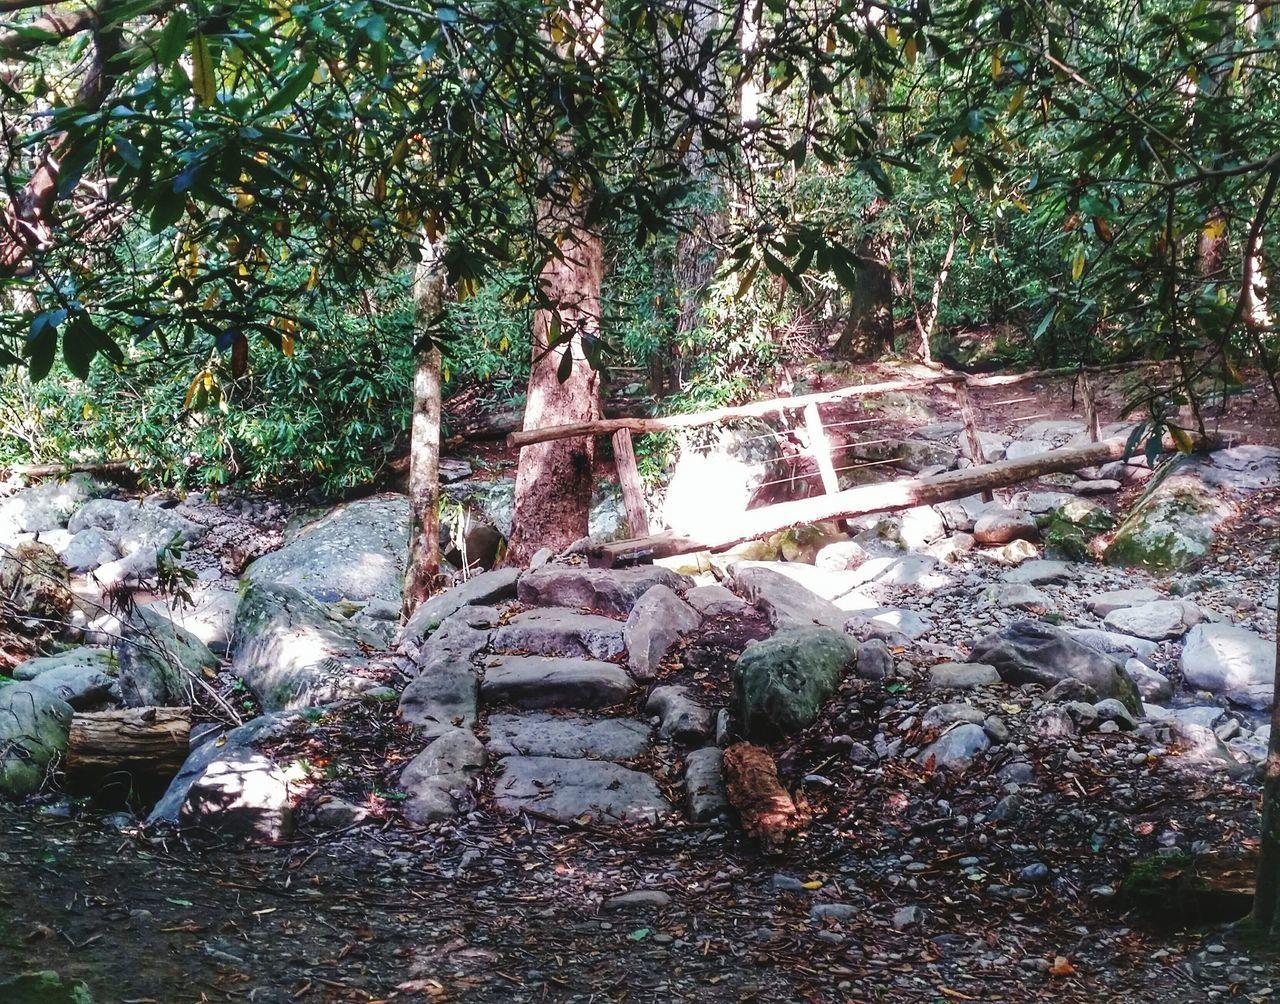 Mountain Hiking Hiking Trails Creek Crossing